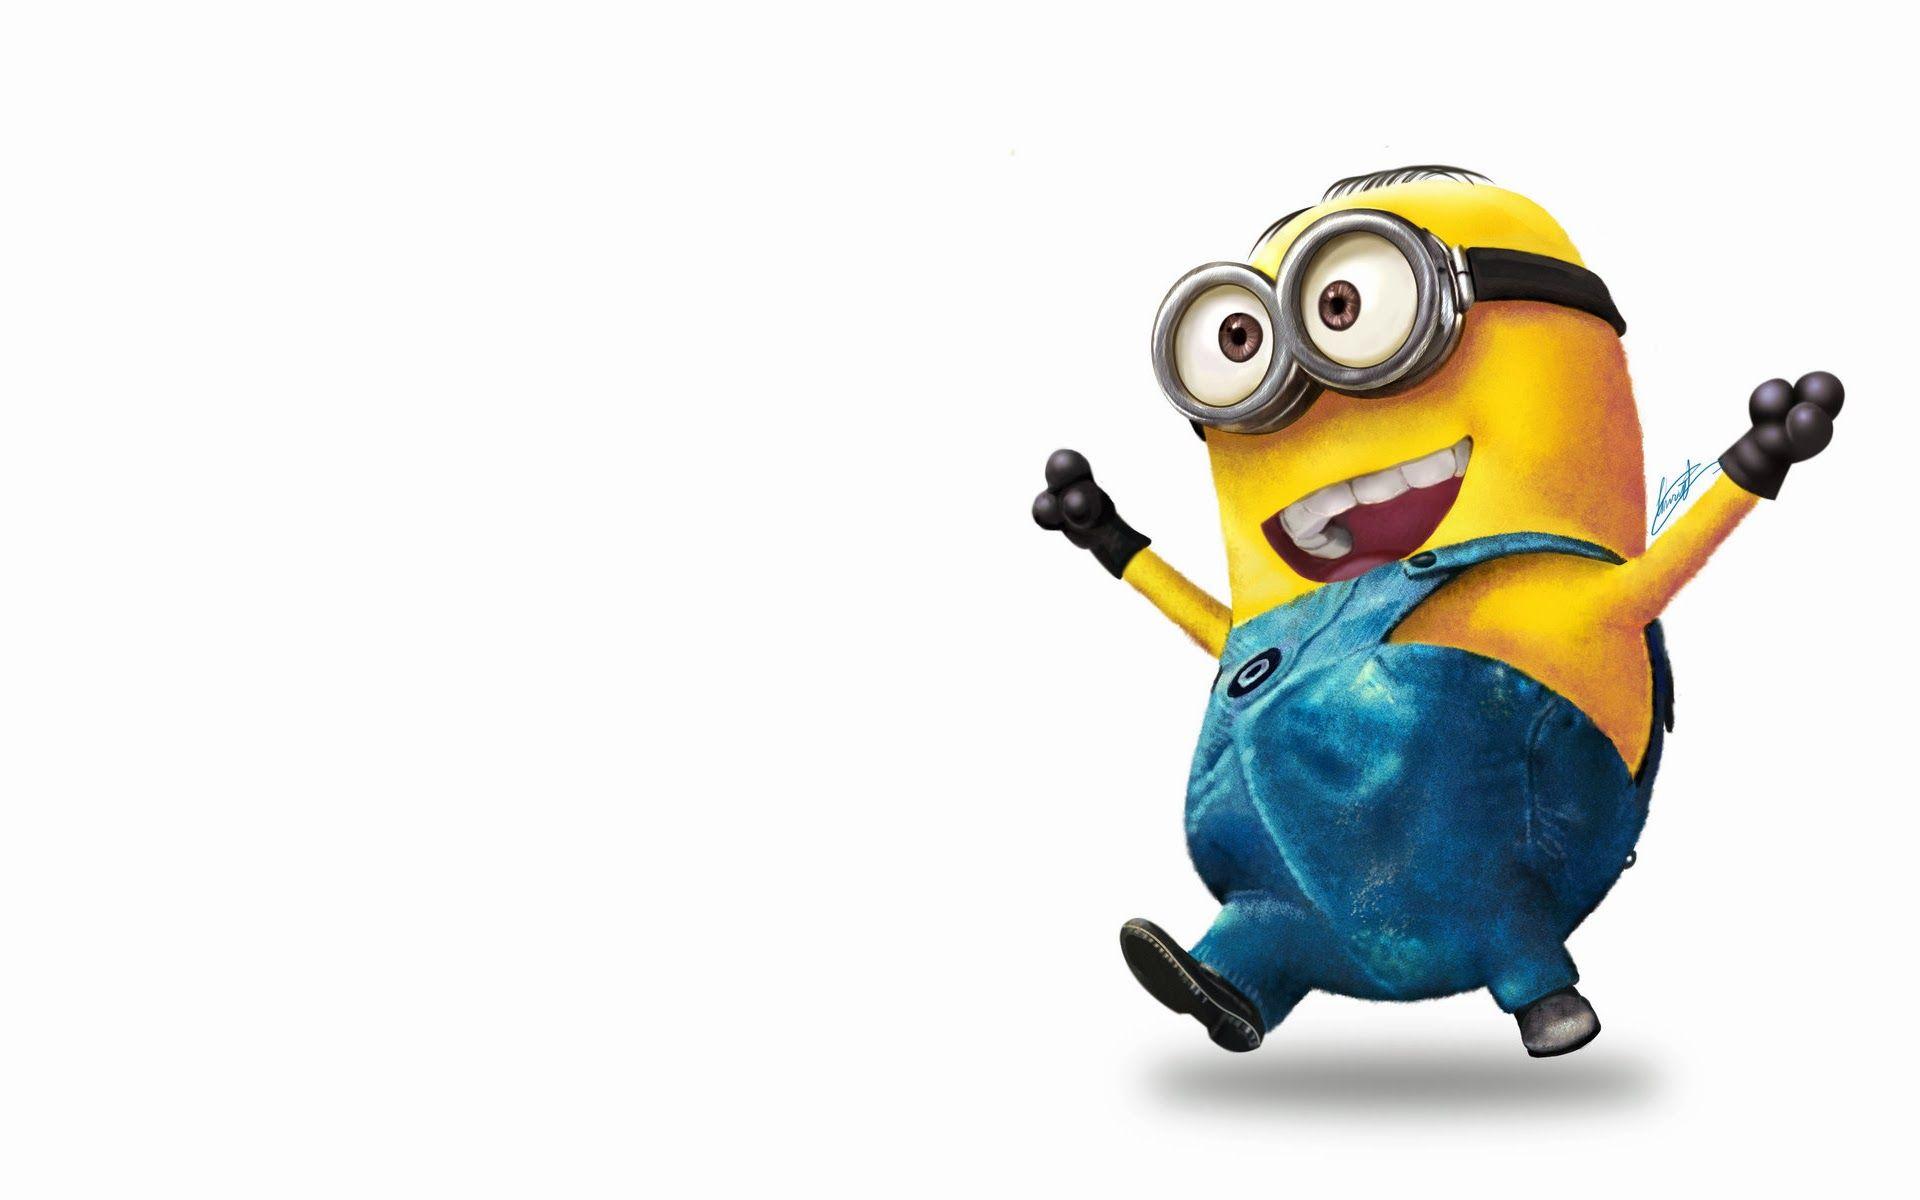 Minions Wallpaper Cartoon Movie Wallpapers Hd Minions Funny Funny Minion Quotes Minions